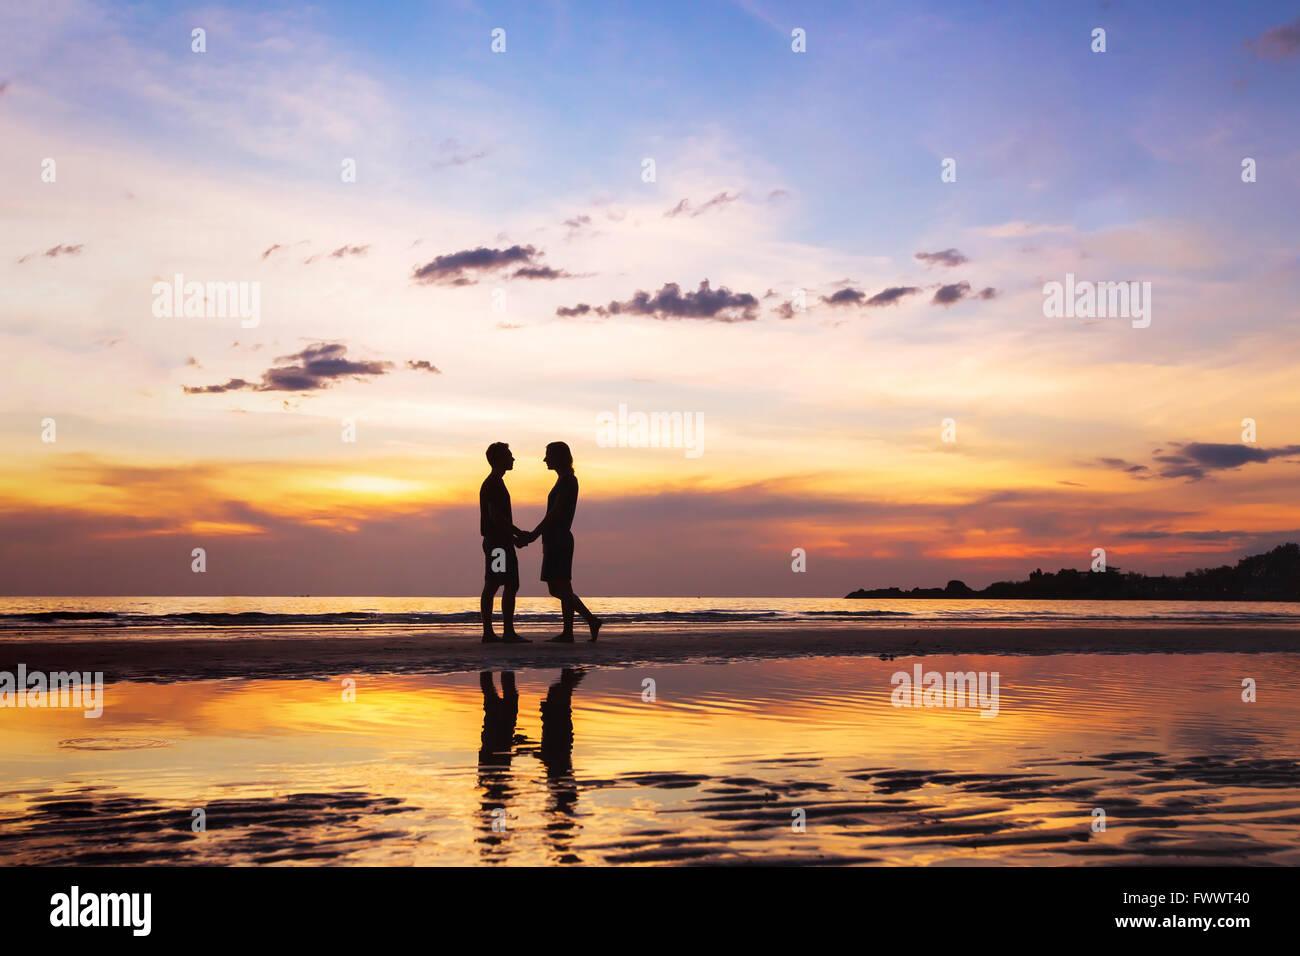 Silhueta de afectuosa casal na praia ao pôr-do-sol, conceito de amor, o homem e a mulher, belo fundo Imagens de Stock